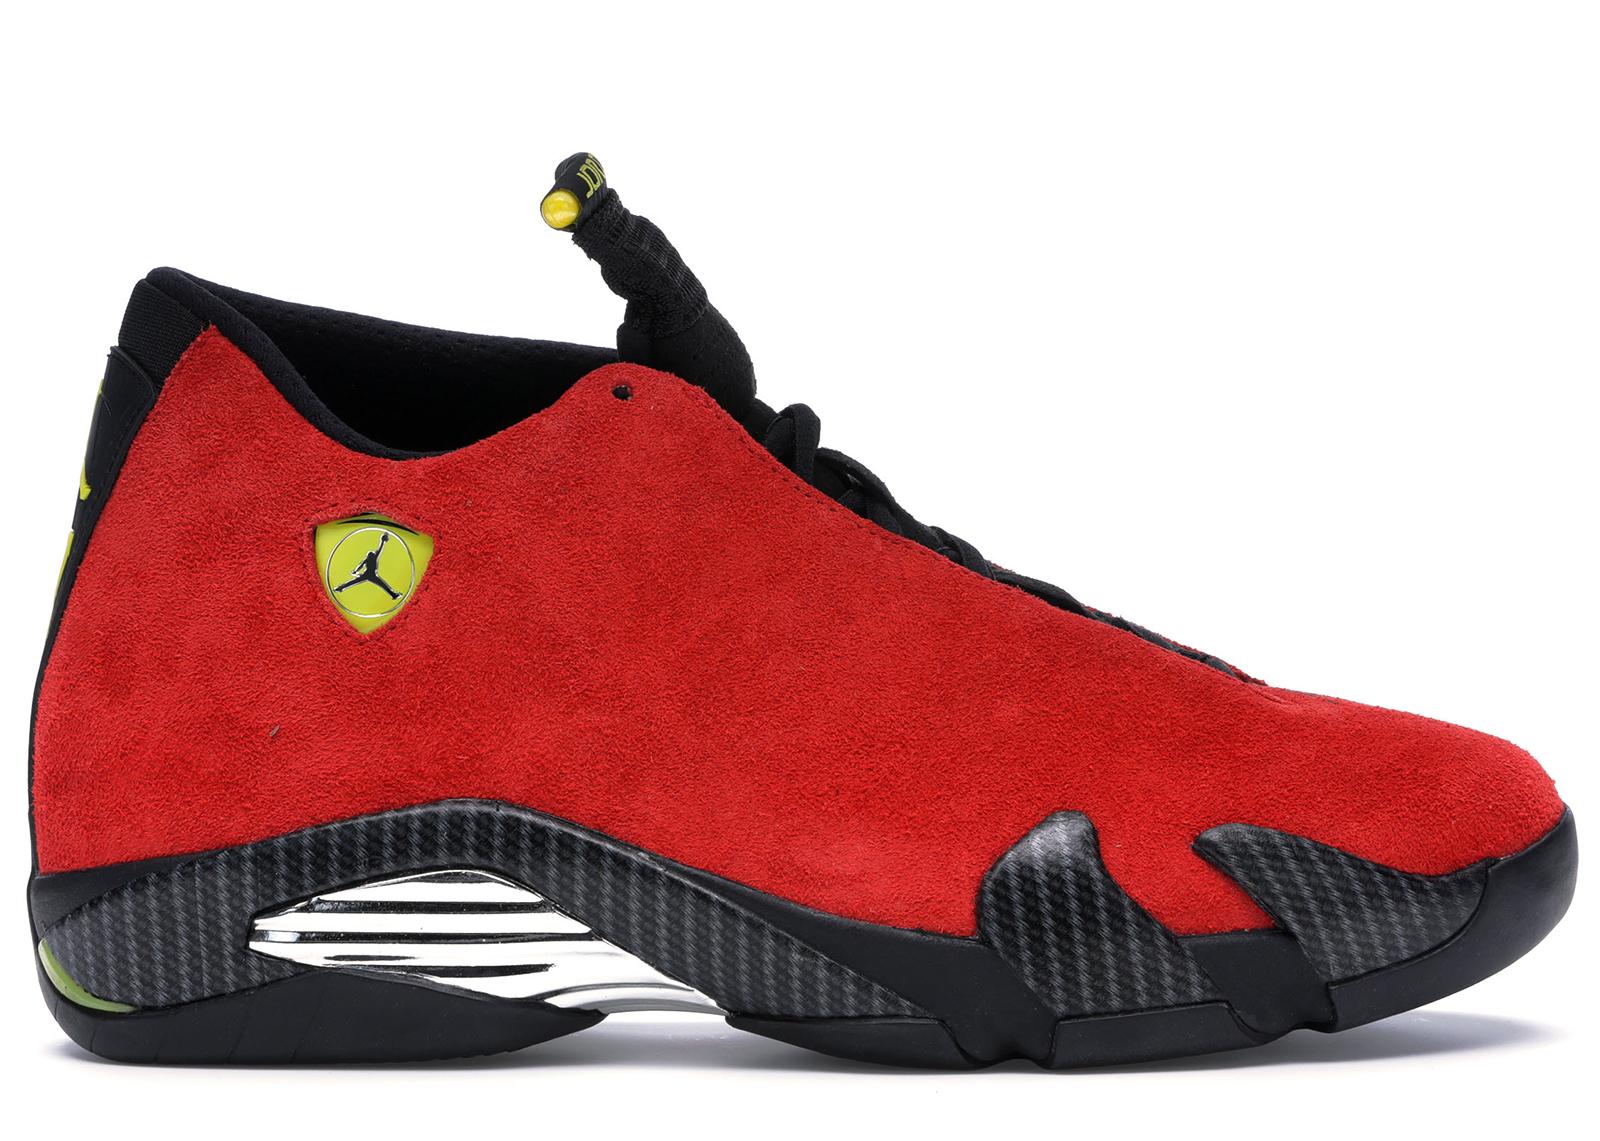 Jordan 14 Retro Challenge Red - 654459-670